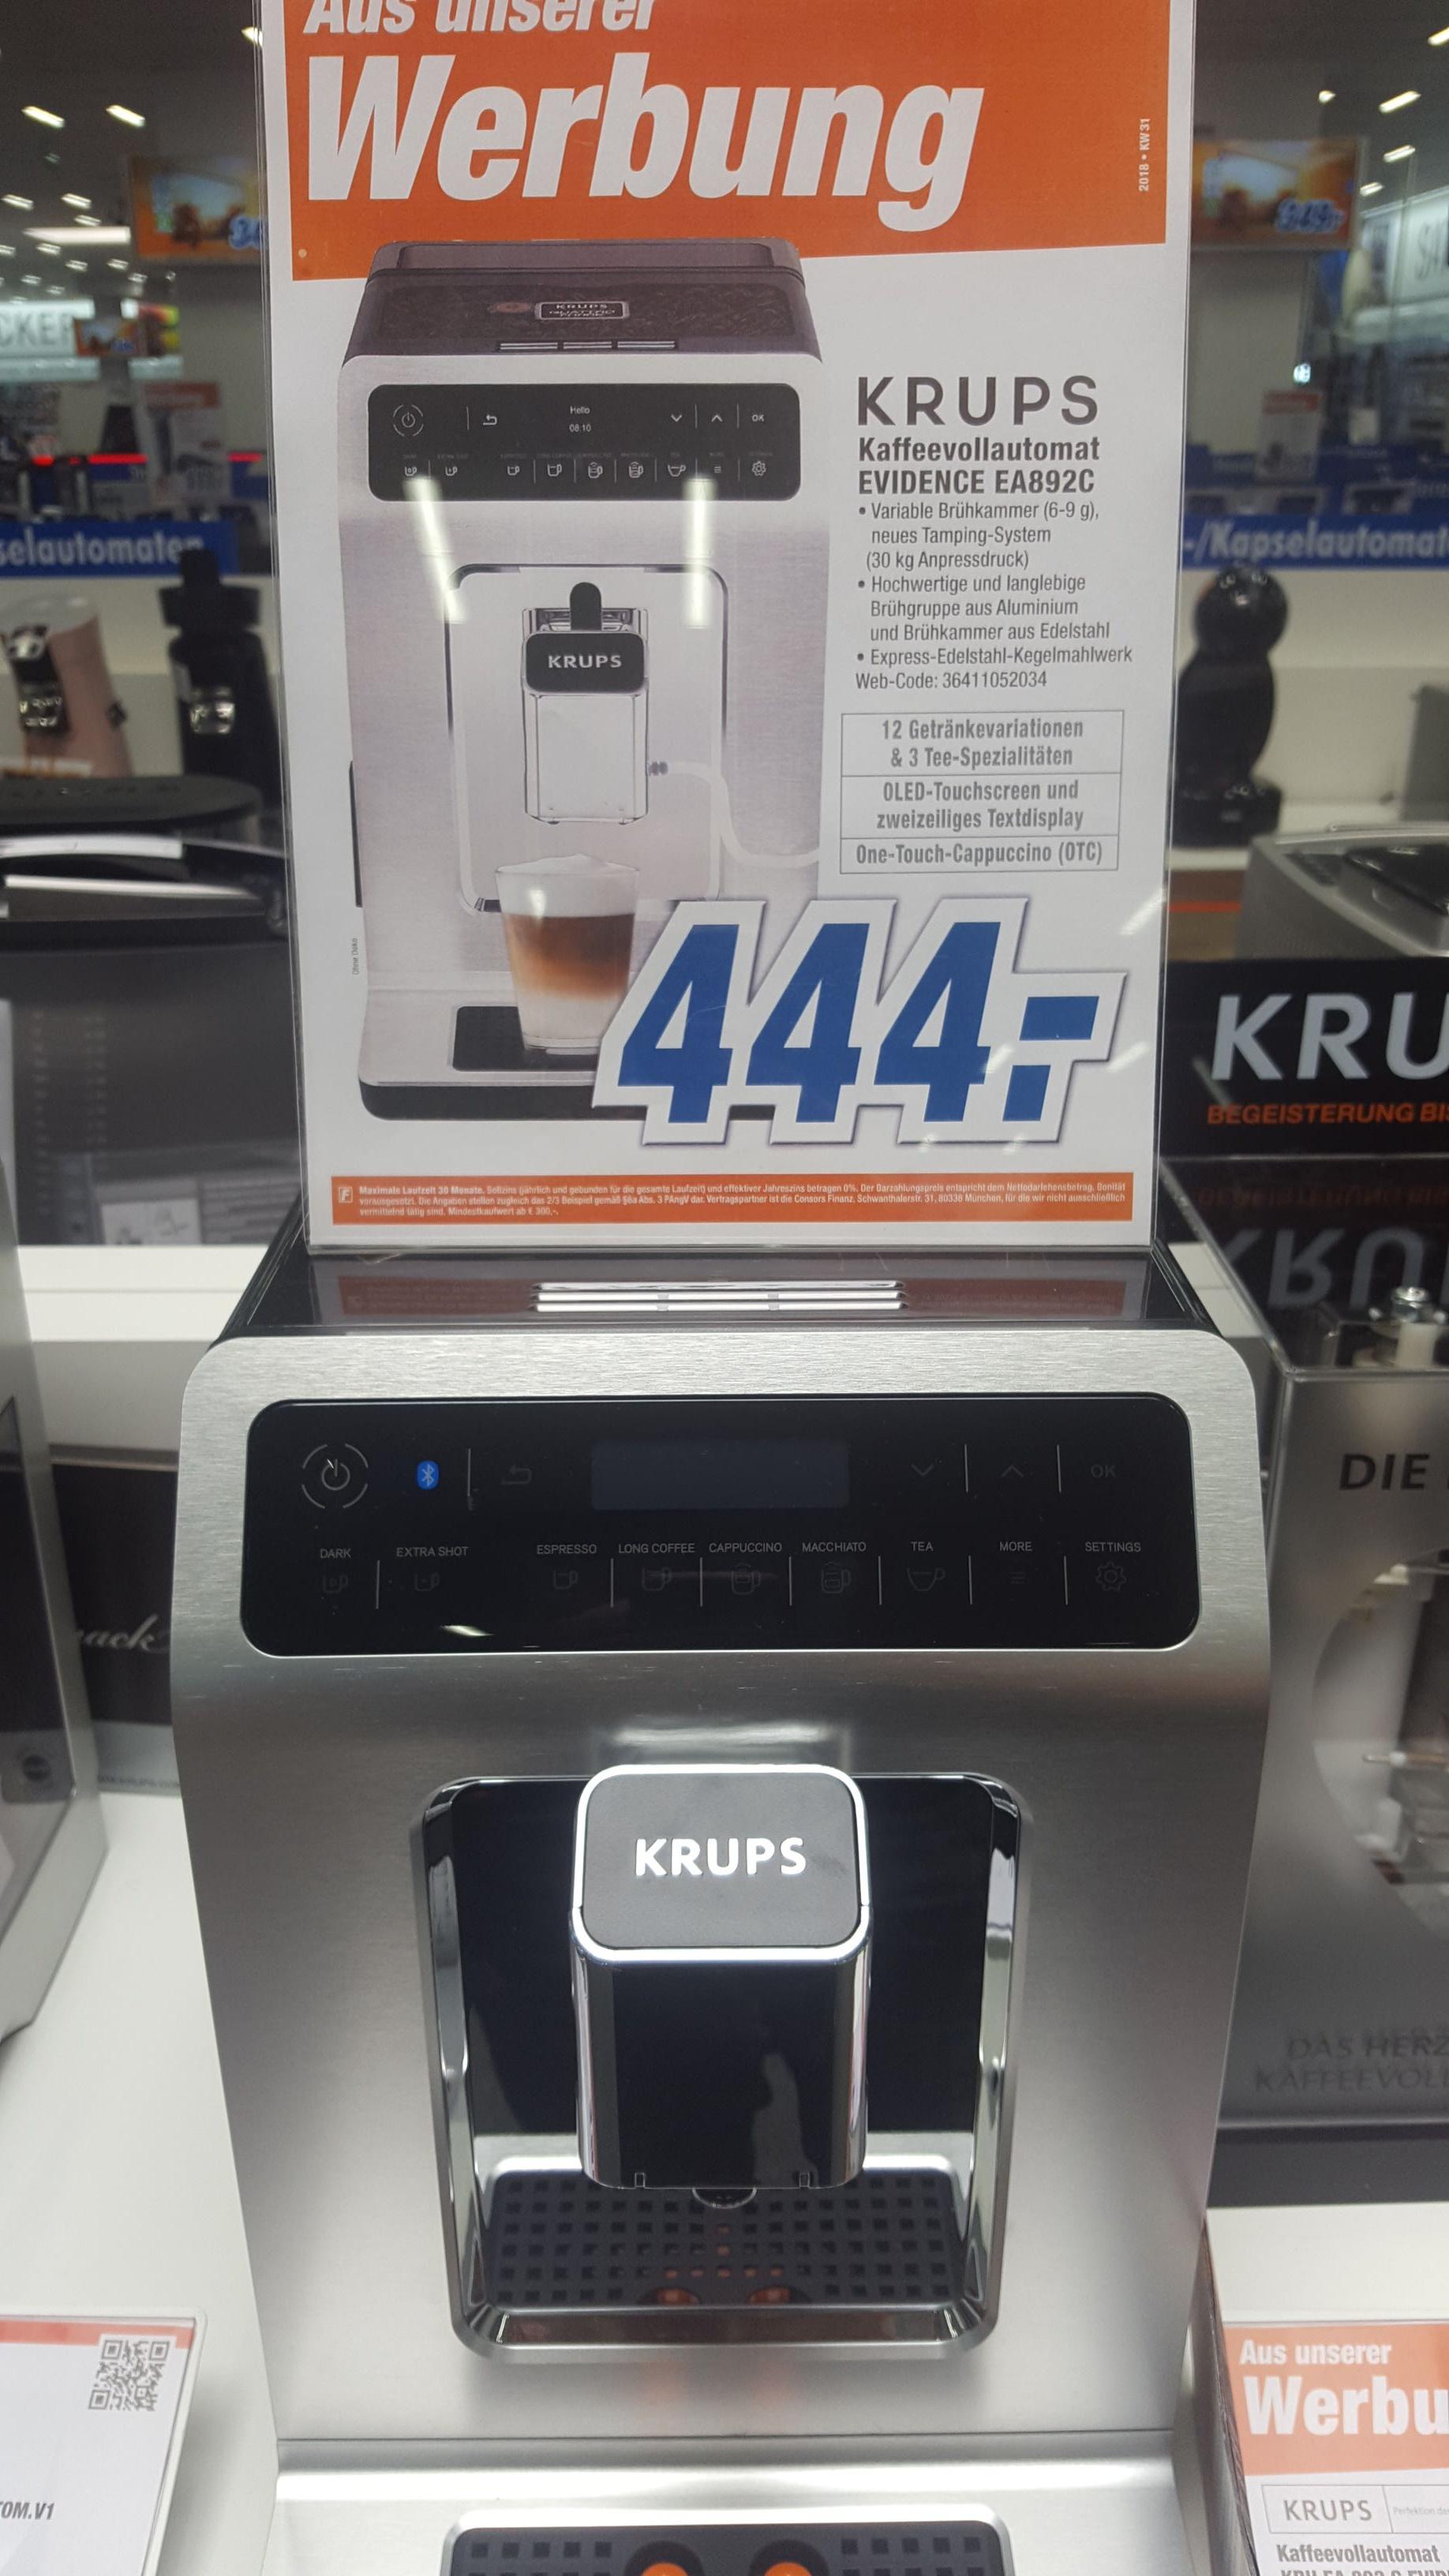 [Lokal Neuss] Krups Evidence EA892C Kaffeevollautomat